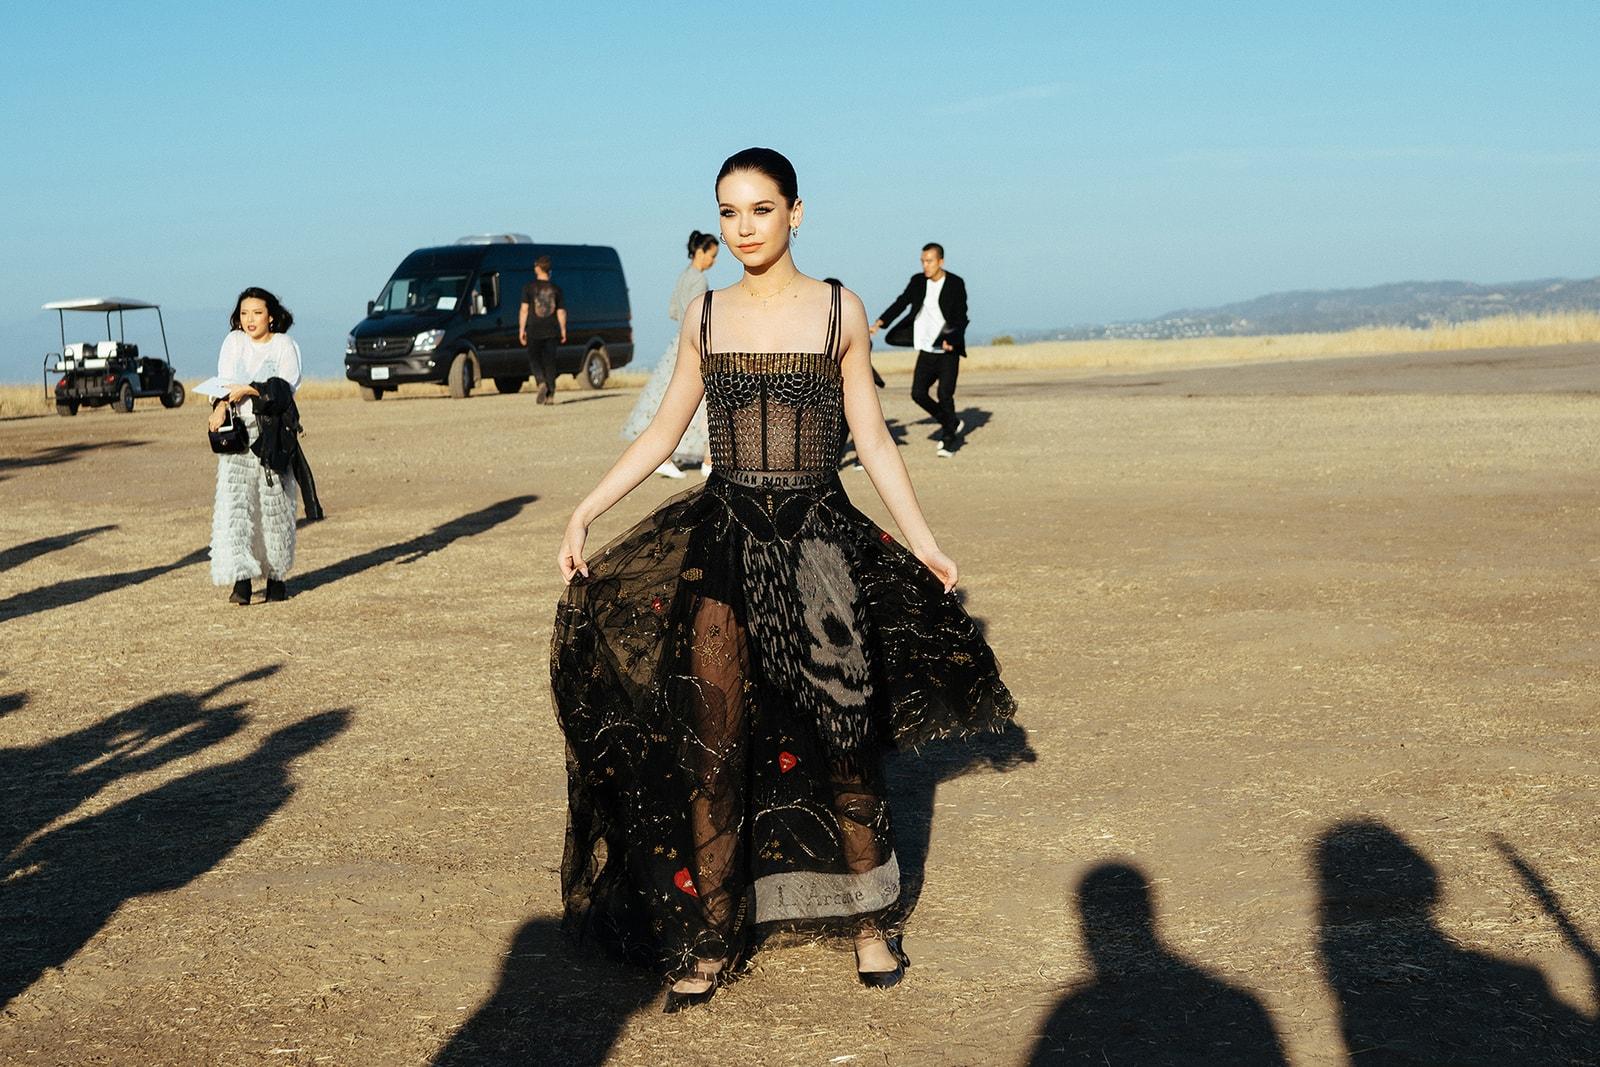 Christian Dior 2018 Cruise Runway Show Rihanna Kiko Mizuhara Brie Larson